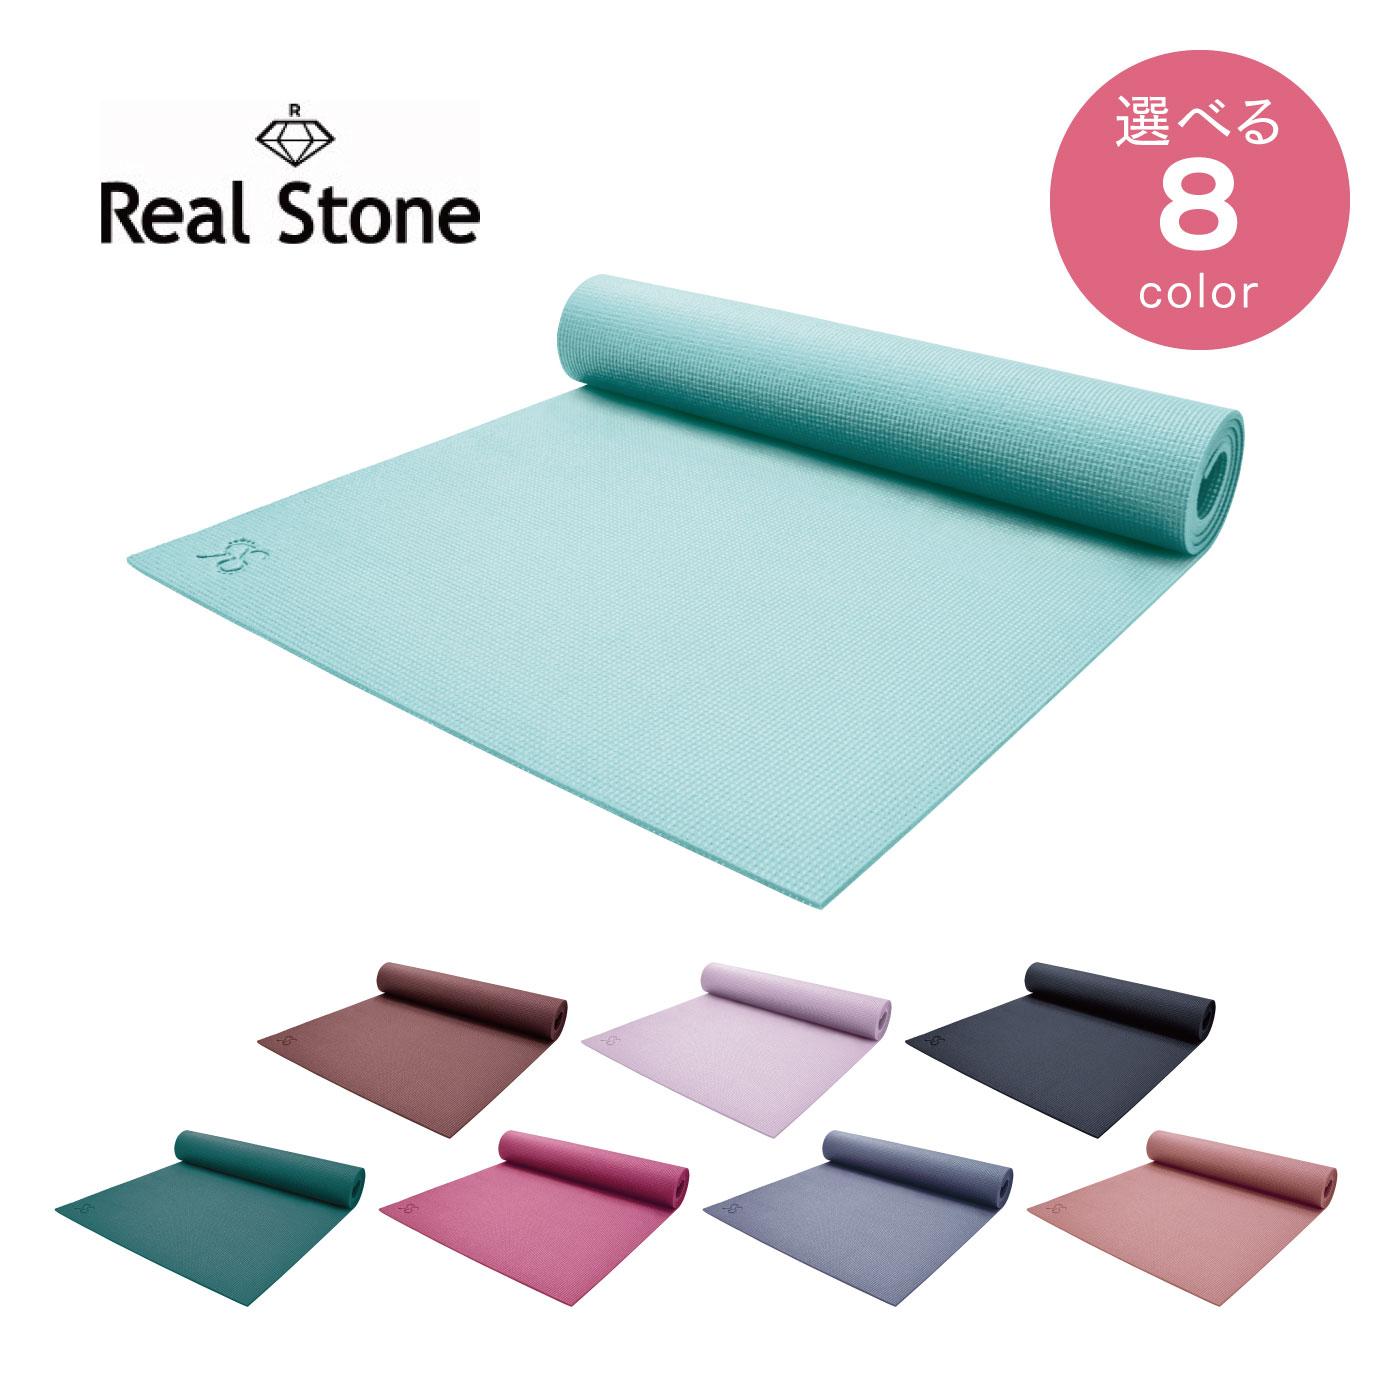 Real Stone 心地よいクッション性 色が選べるヨガマット